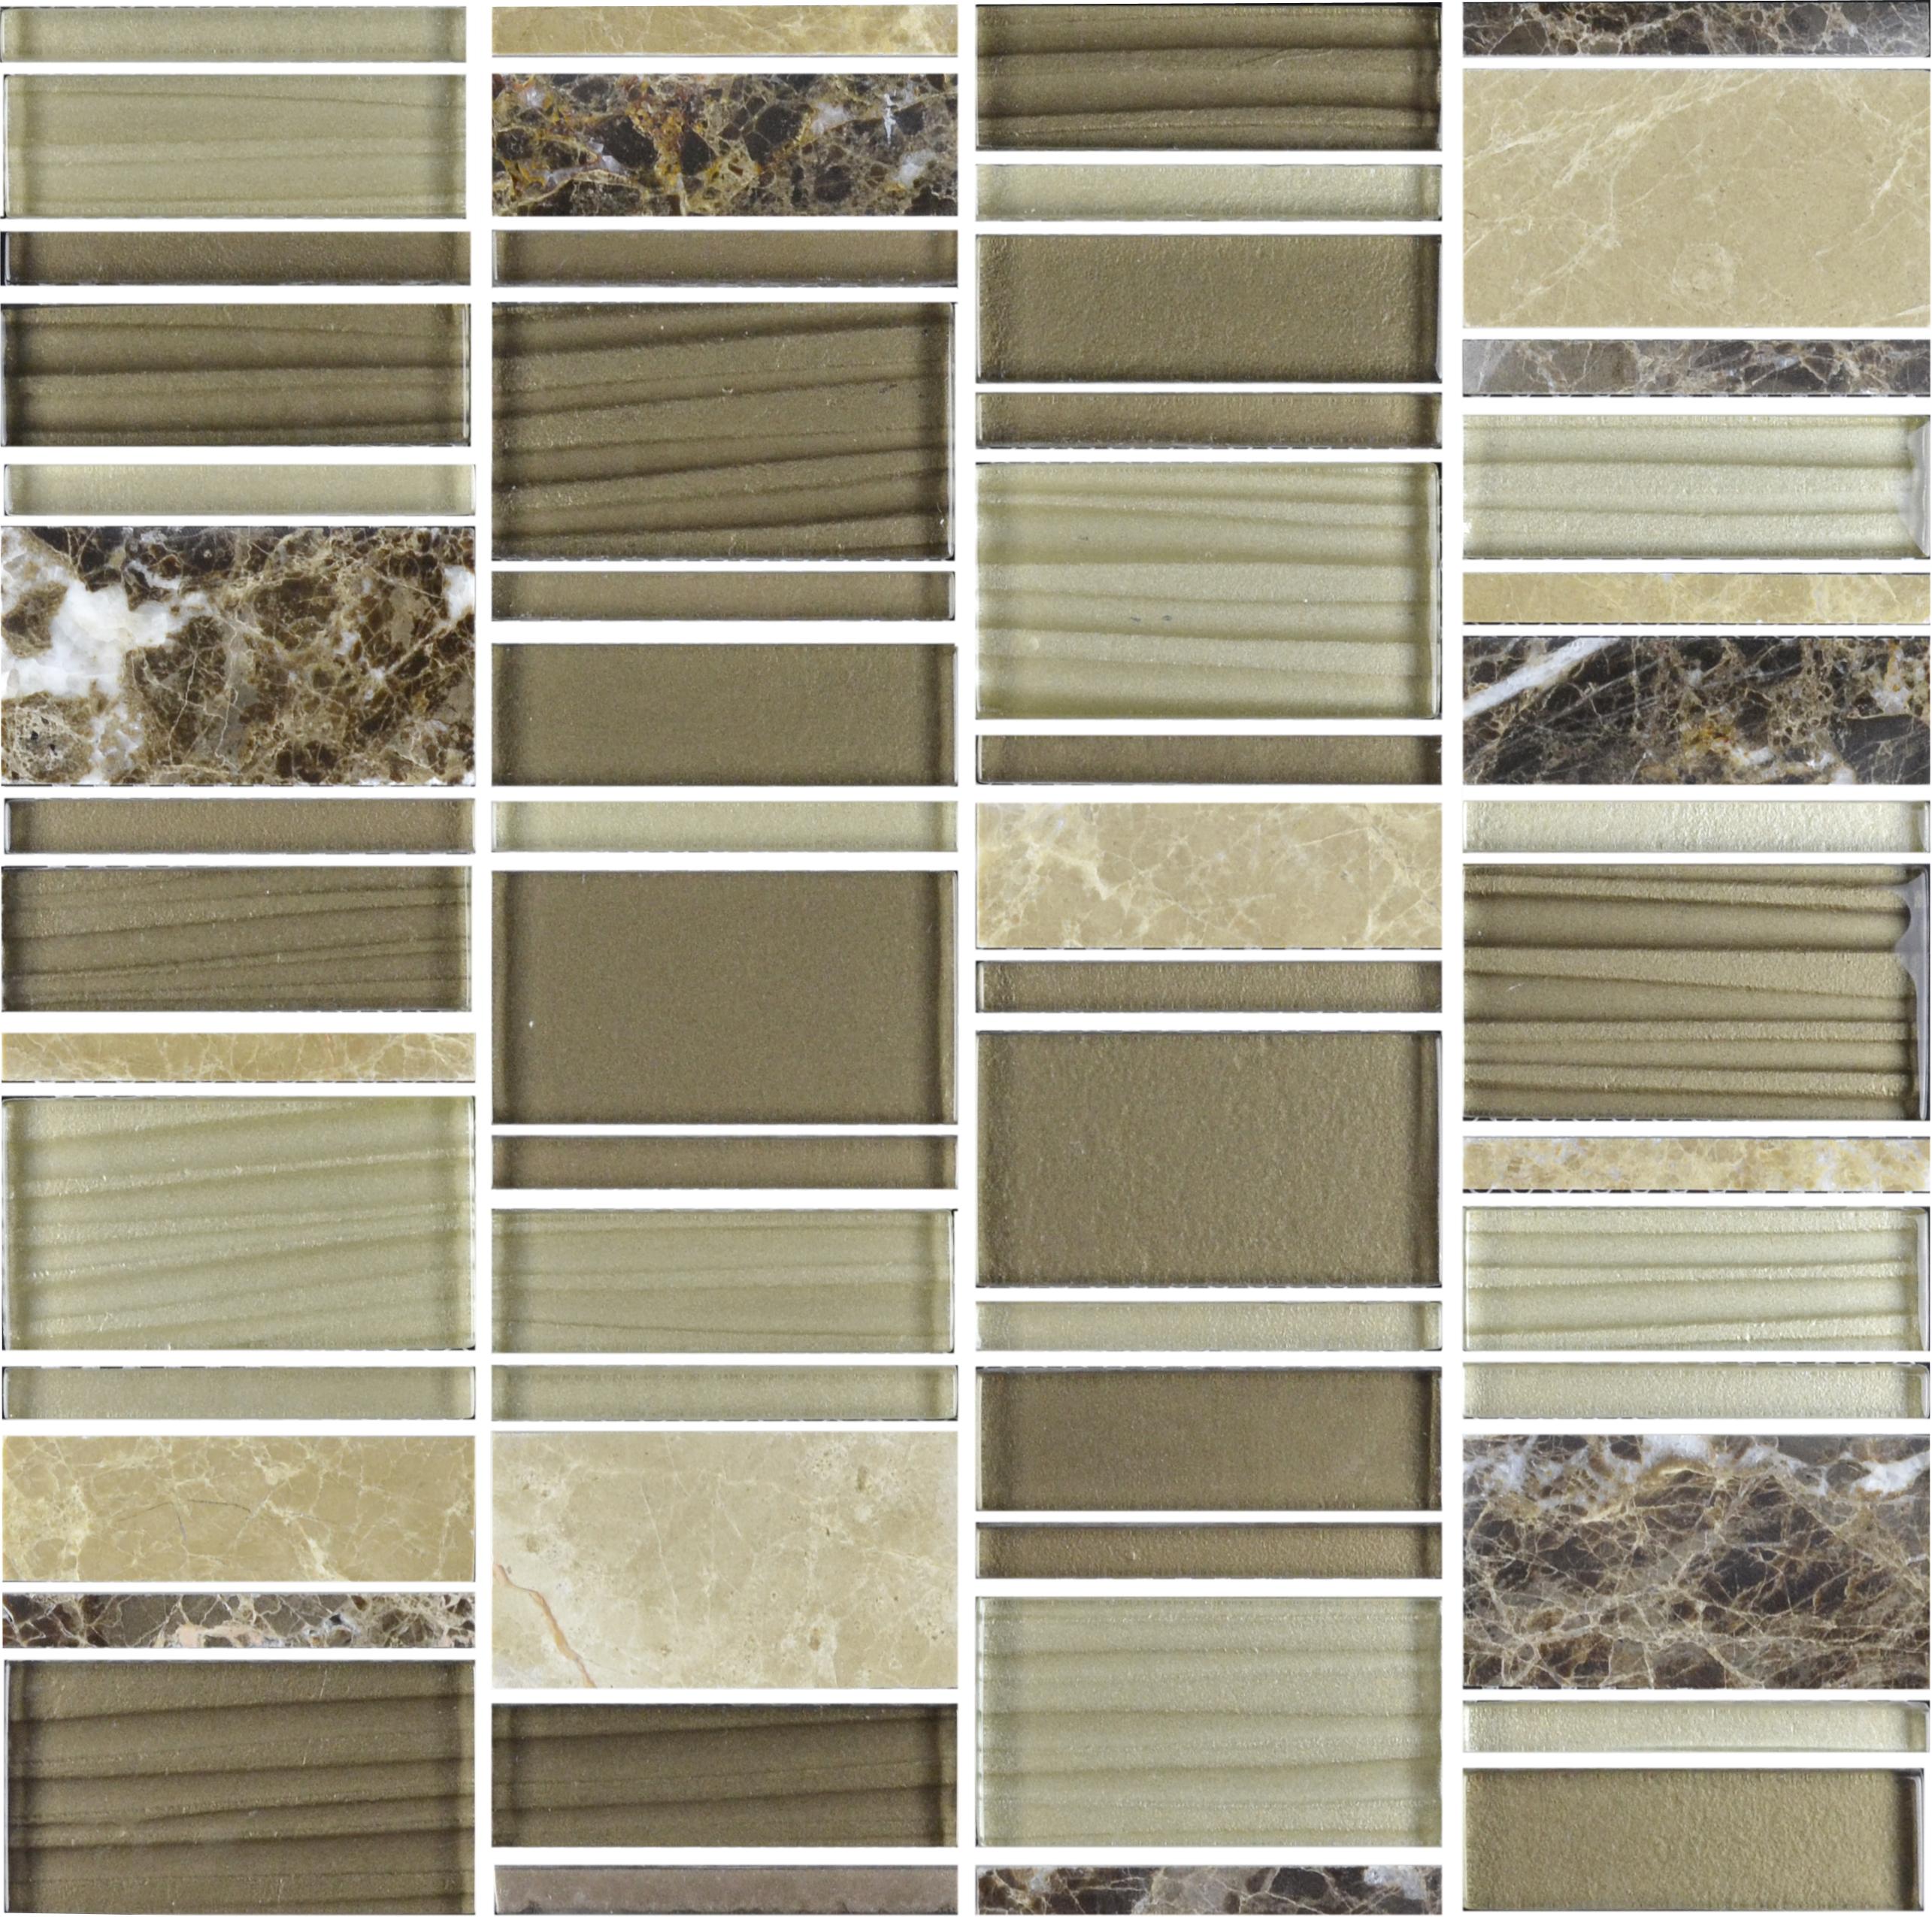 Cinque Glana Braun/Beige be-PMH018 Mosaik 30x30